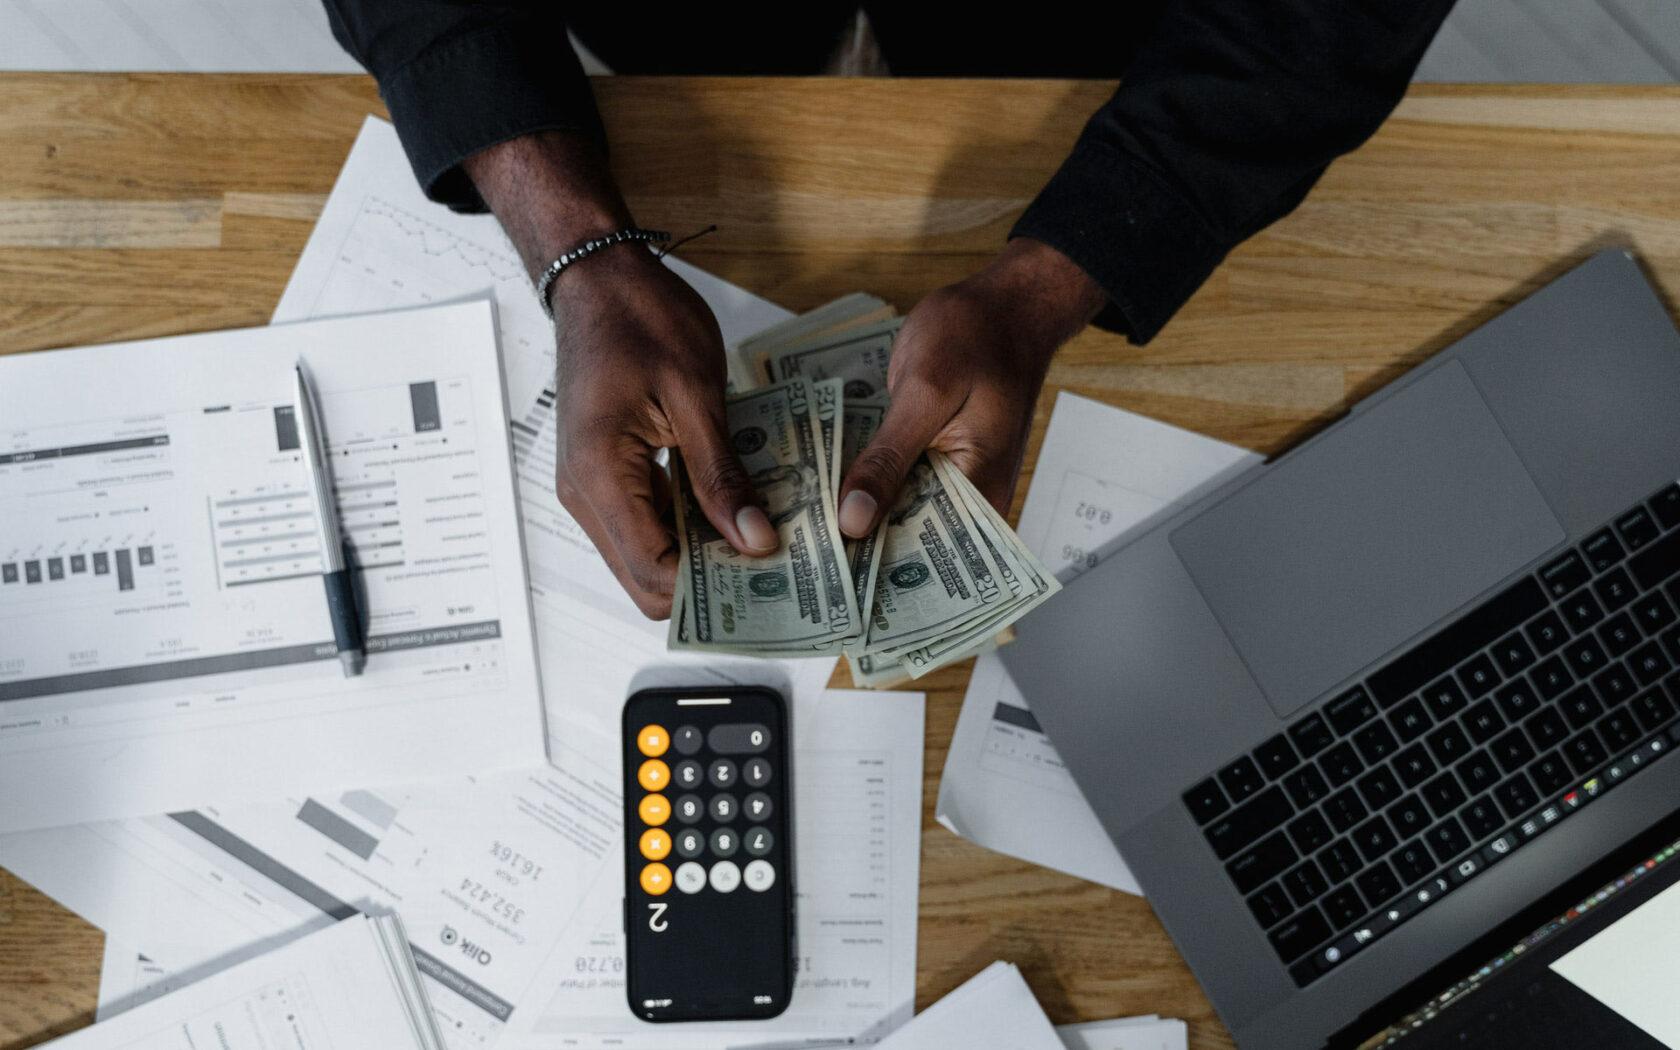 Broker Compensation